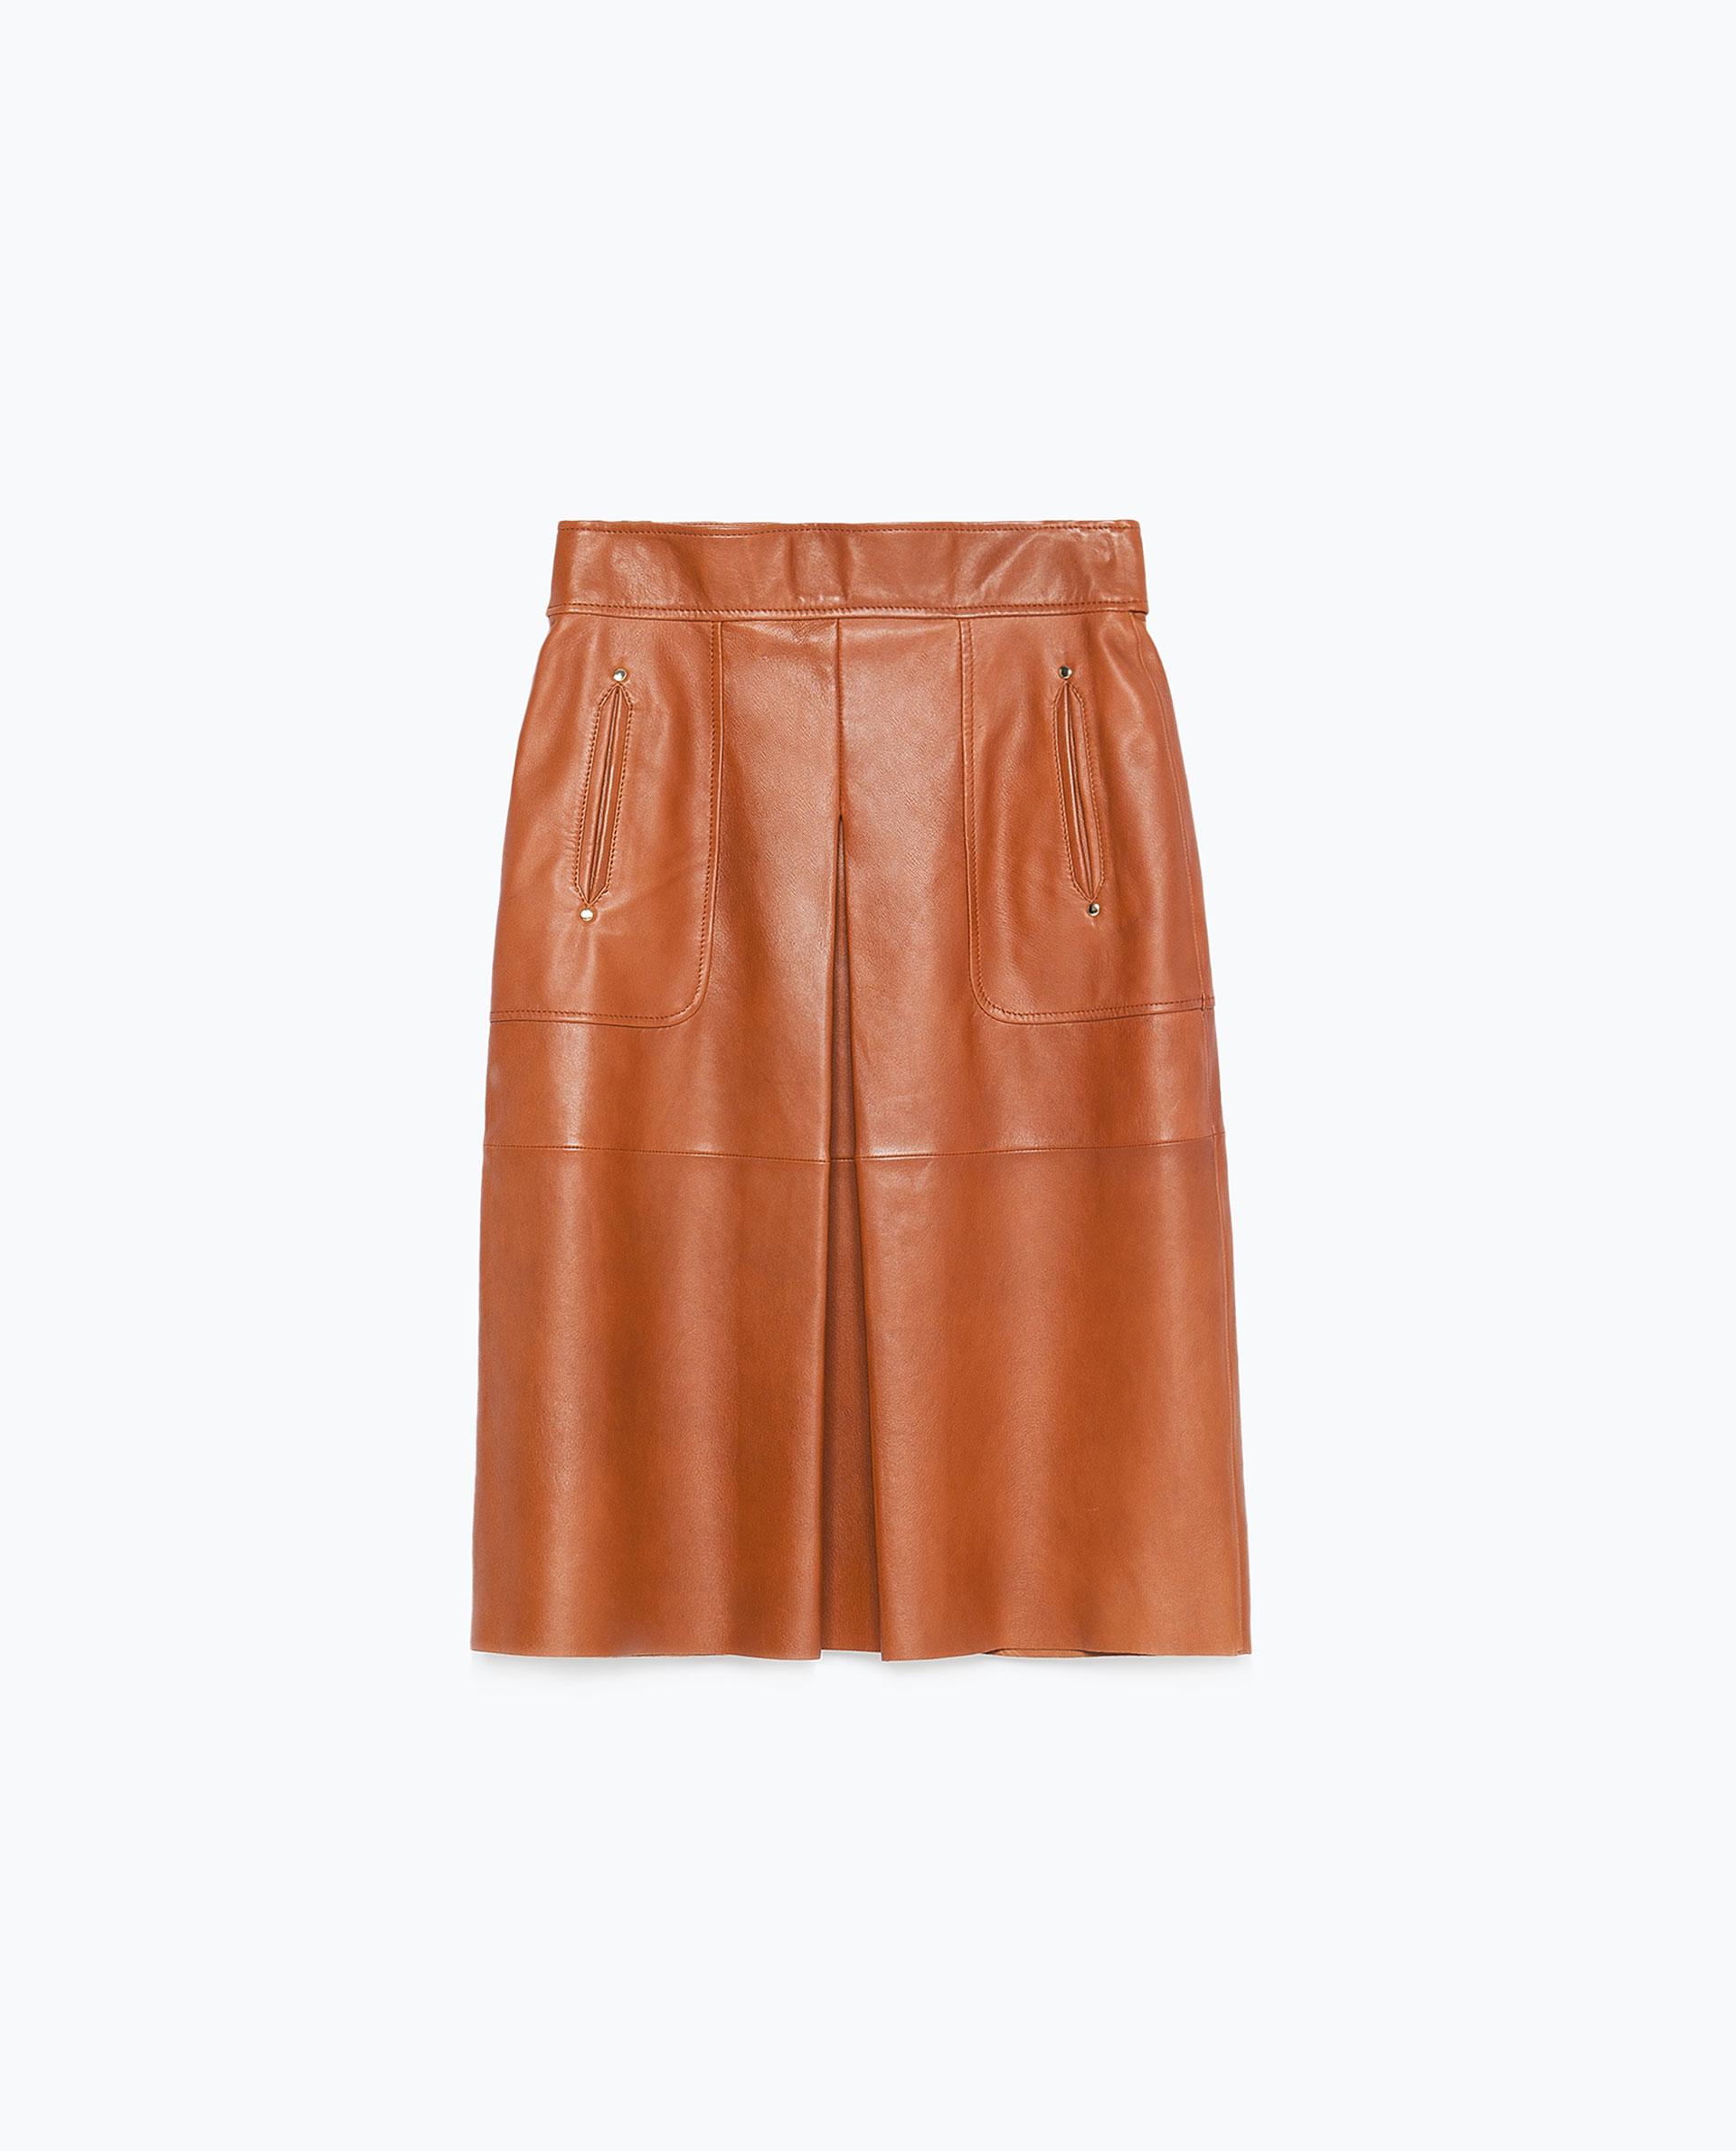 Zara Leather Skirt in Brown | Lyst